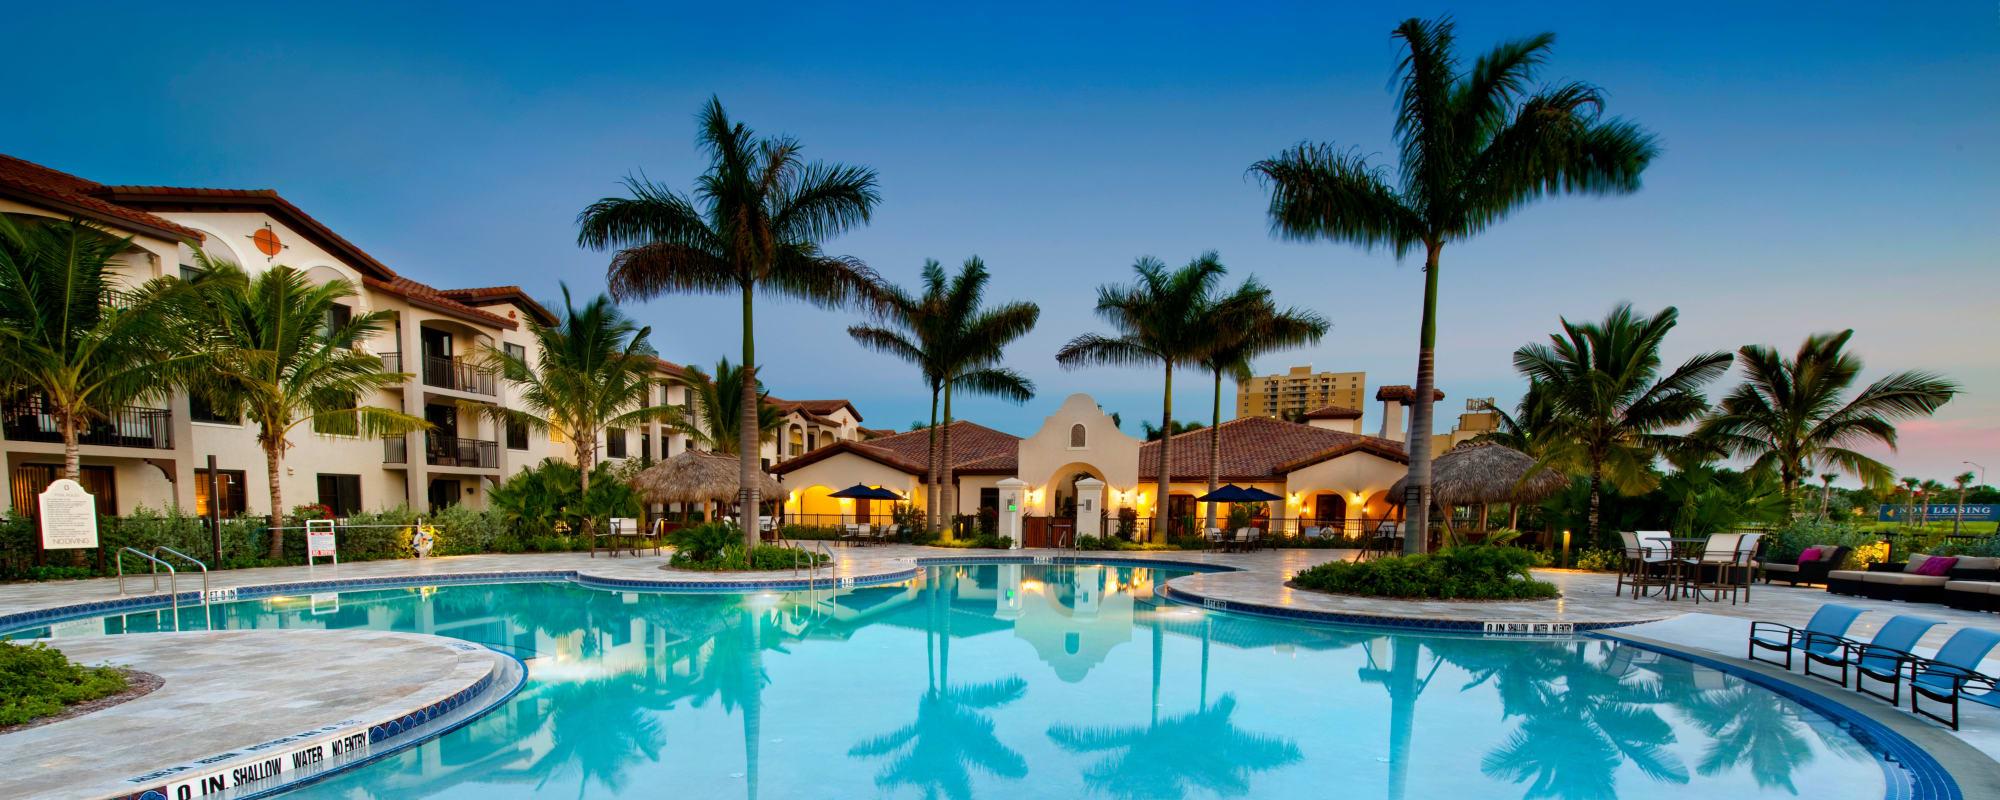 Miami, Florida, apartments at Doral View Apartments